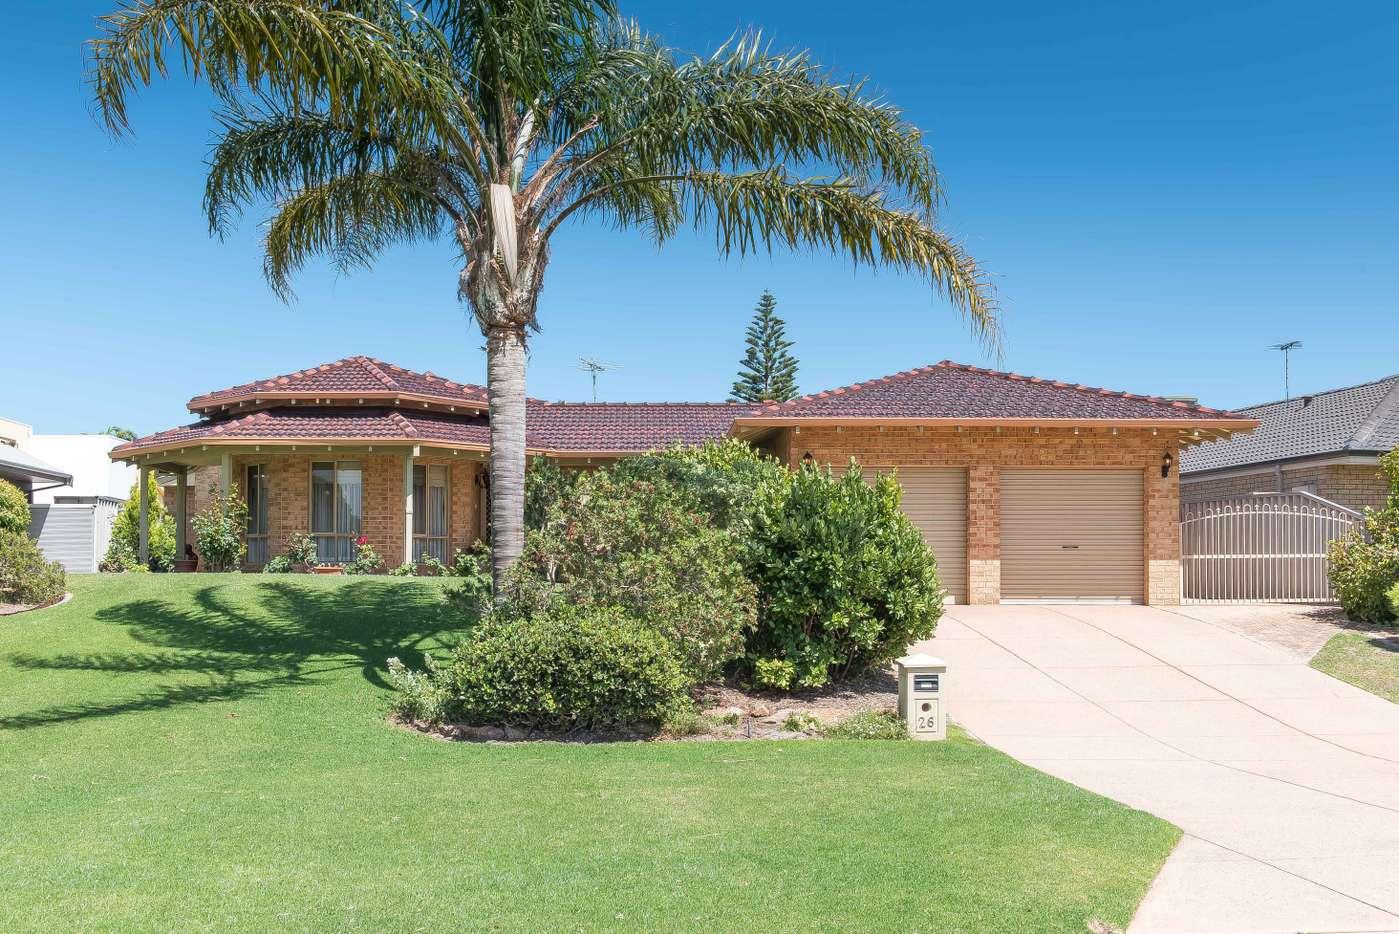 Main view of Homely house listing, 26 Montague Way, Kallaroo, WA 6025